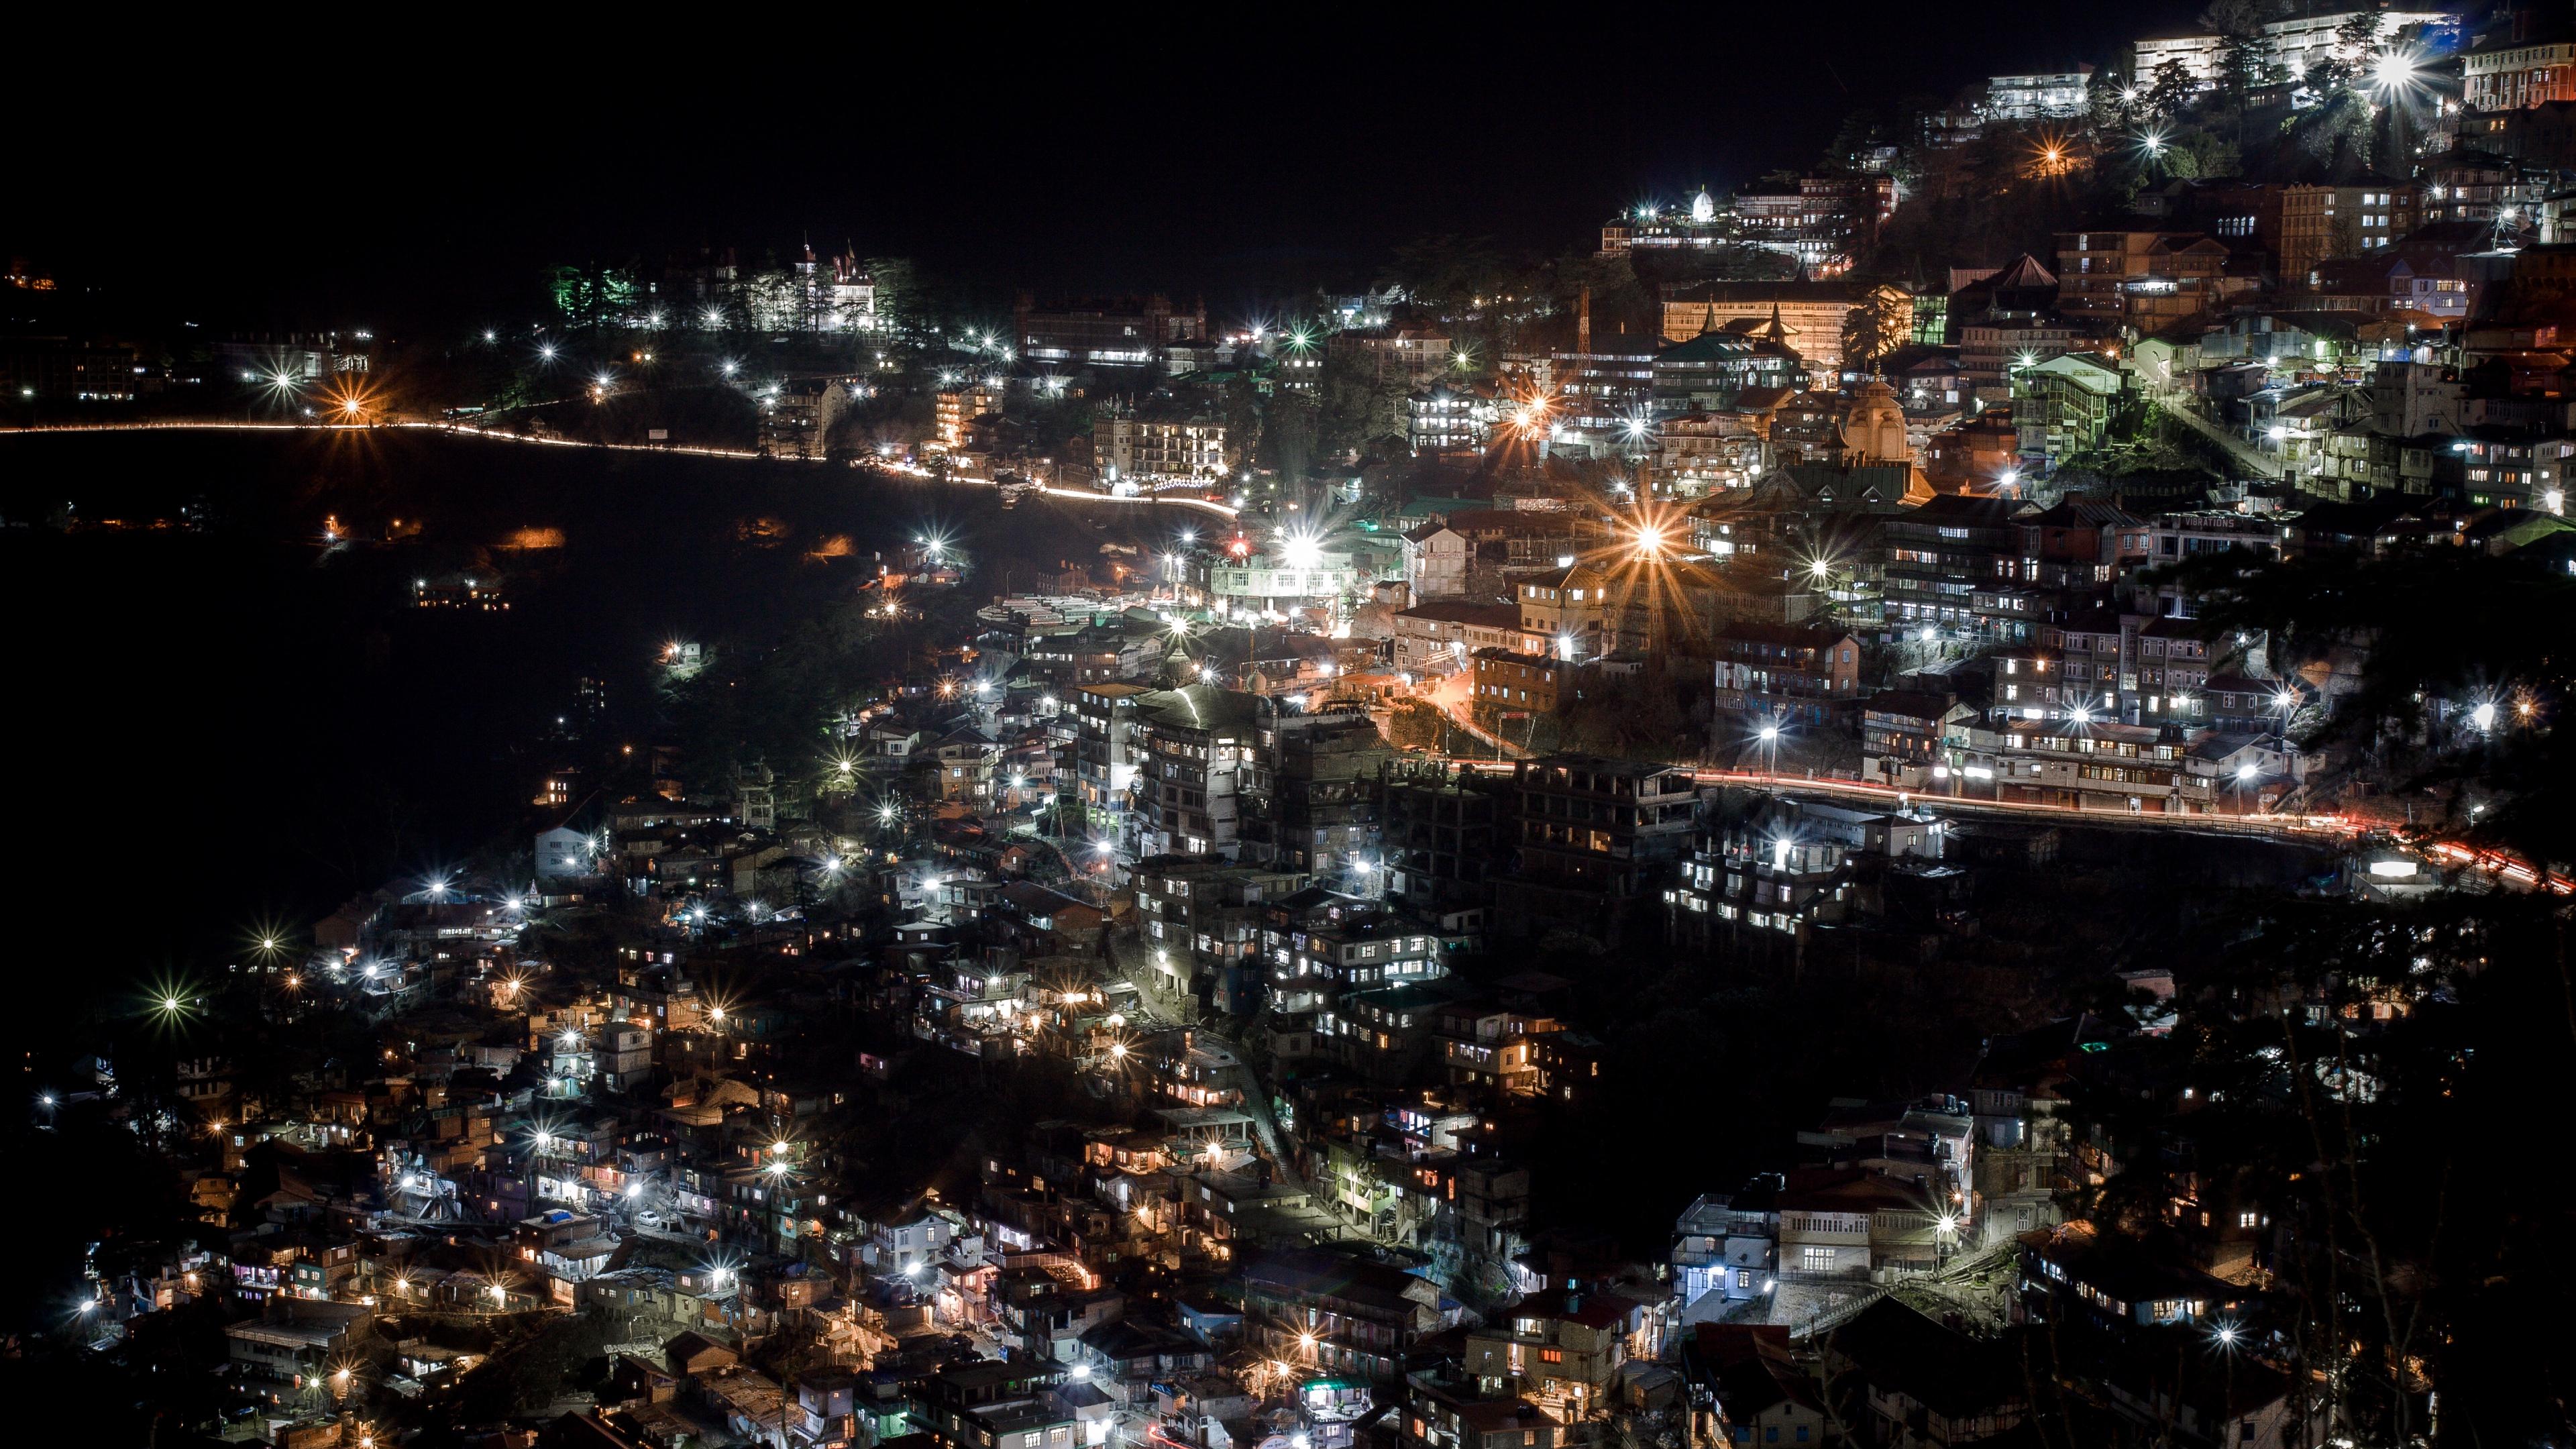 city night city lights shimla manali india 4k 1538066685 - city, night, city lights, shimla manali, india 4k - Night, city lights, City